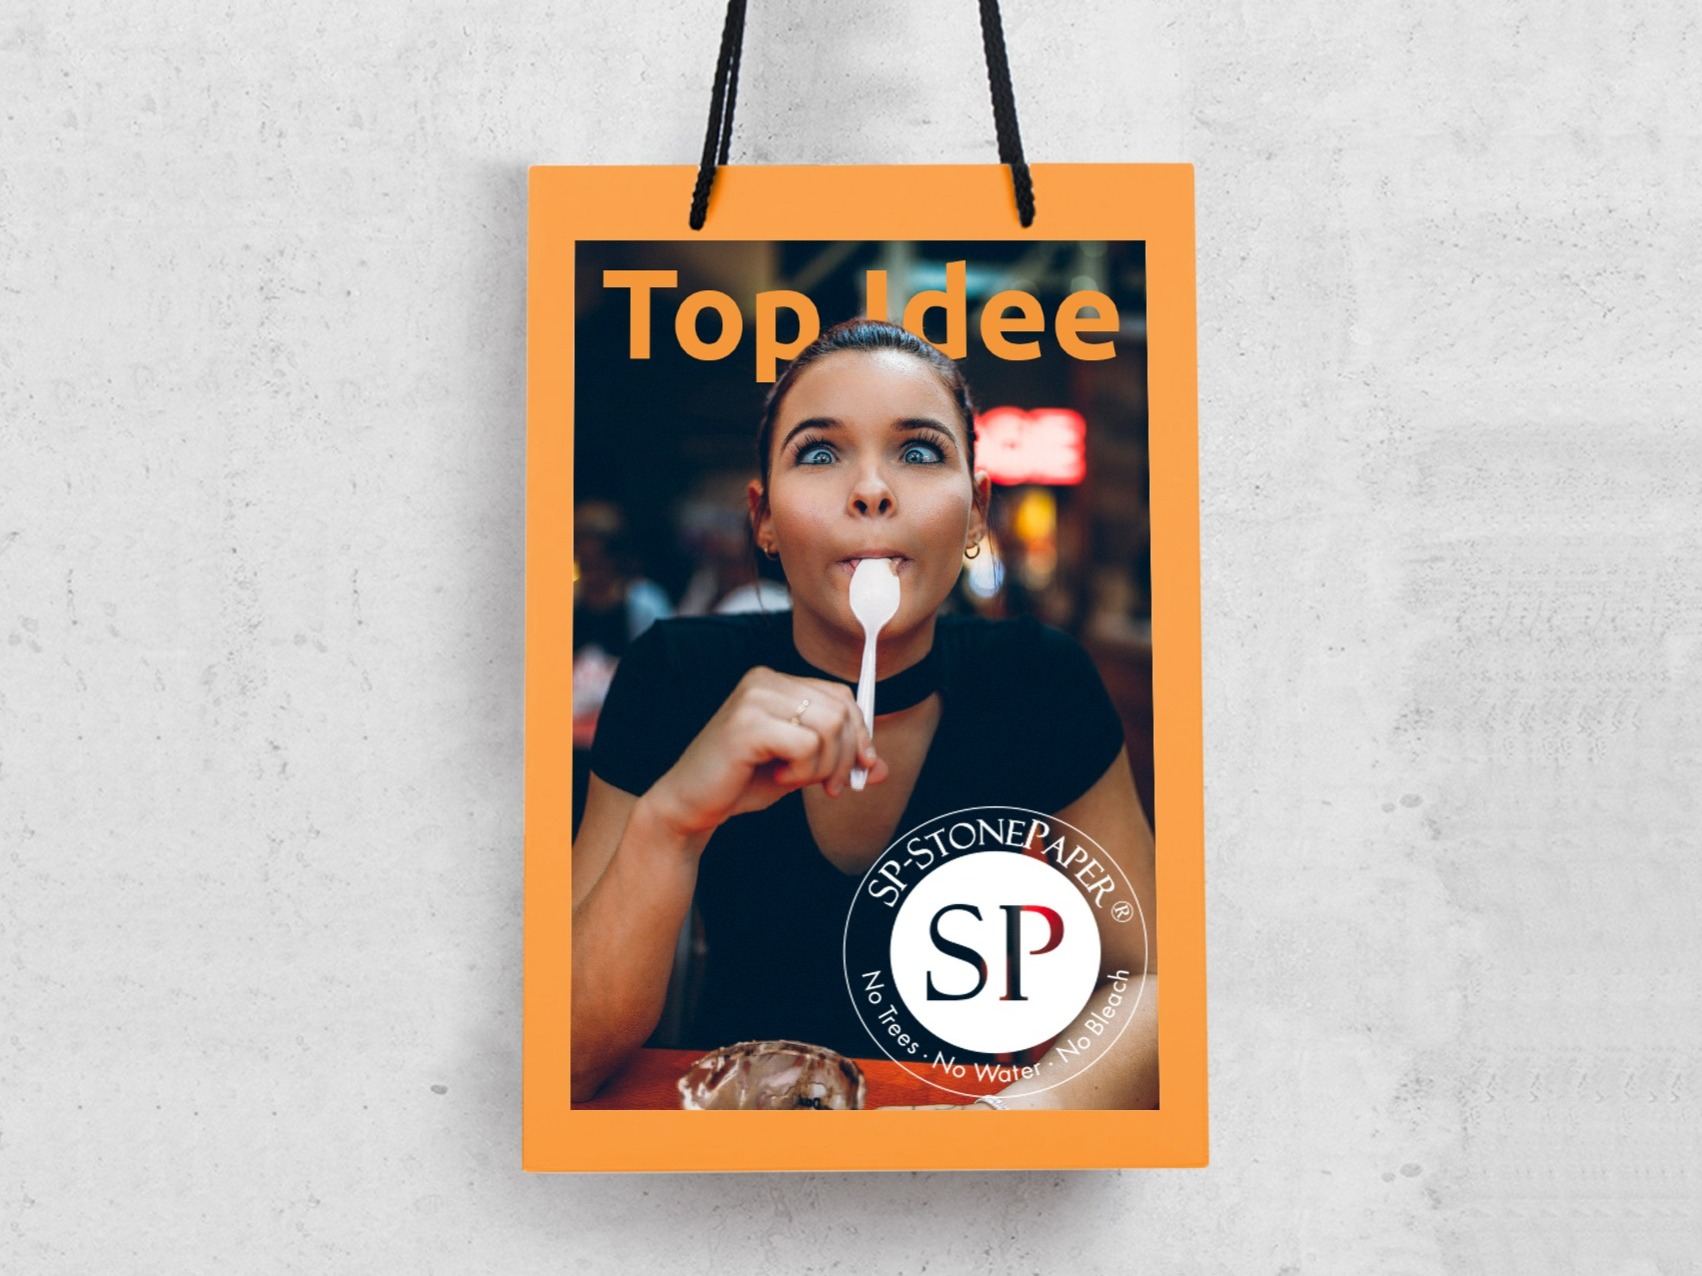 TopIdee SP-StonePaper®